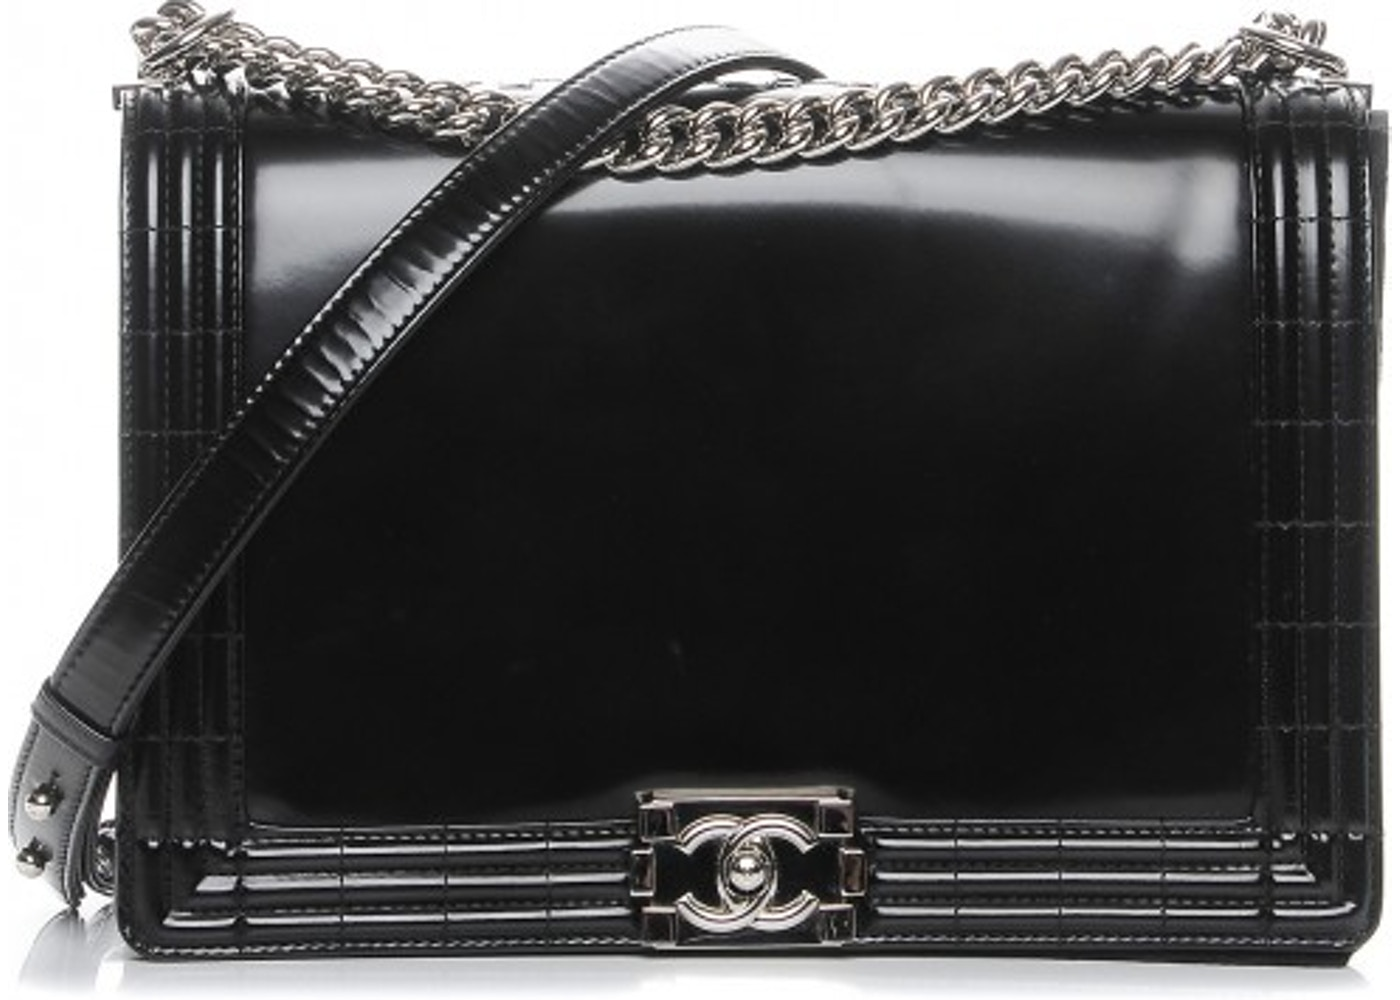 62e67cb22a35 Chanel Reverso Boy Flap Glazed Large Black. Glazed Large Black